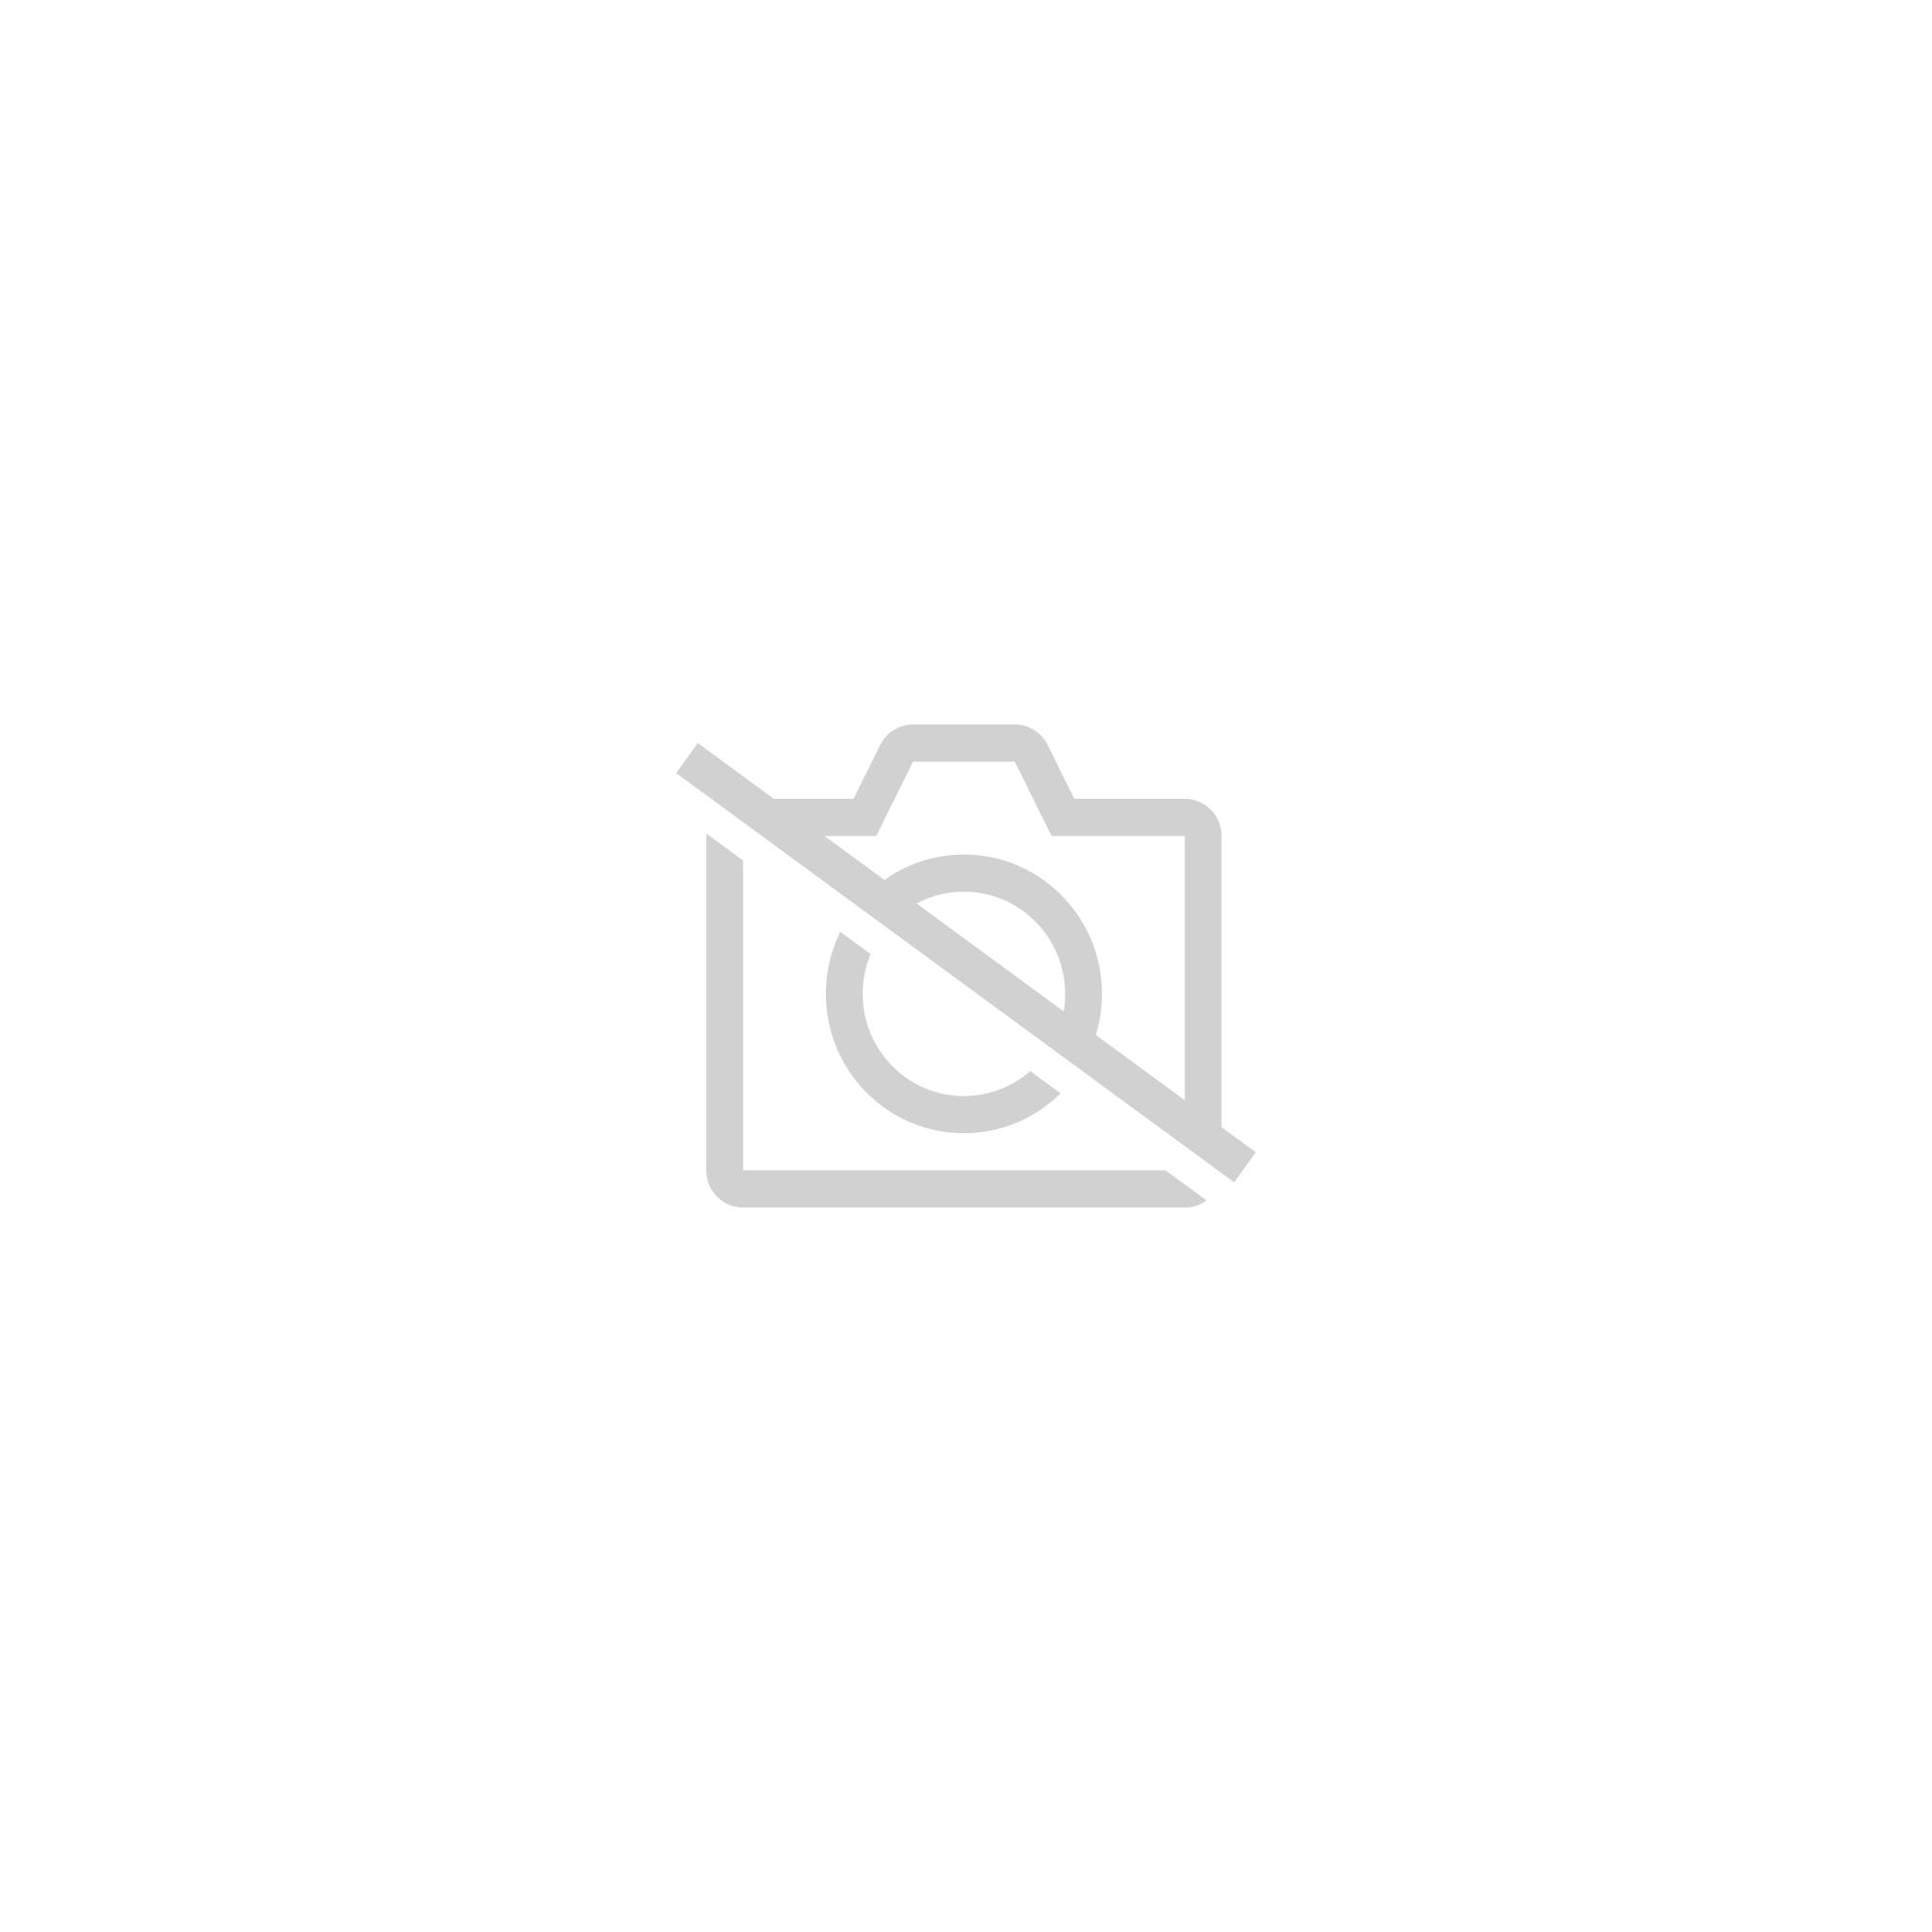 9ed2810bb33f4 tee shirt bleu marine fille - www.goldpoint.be